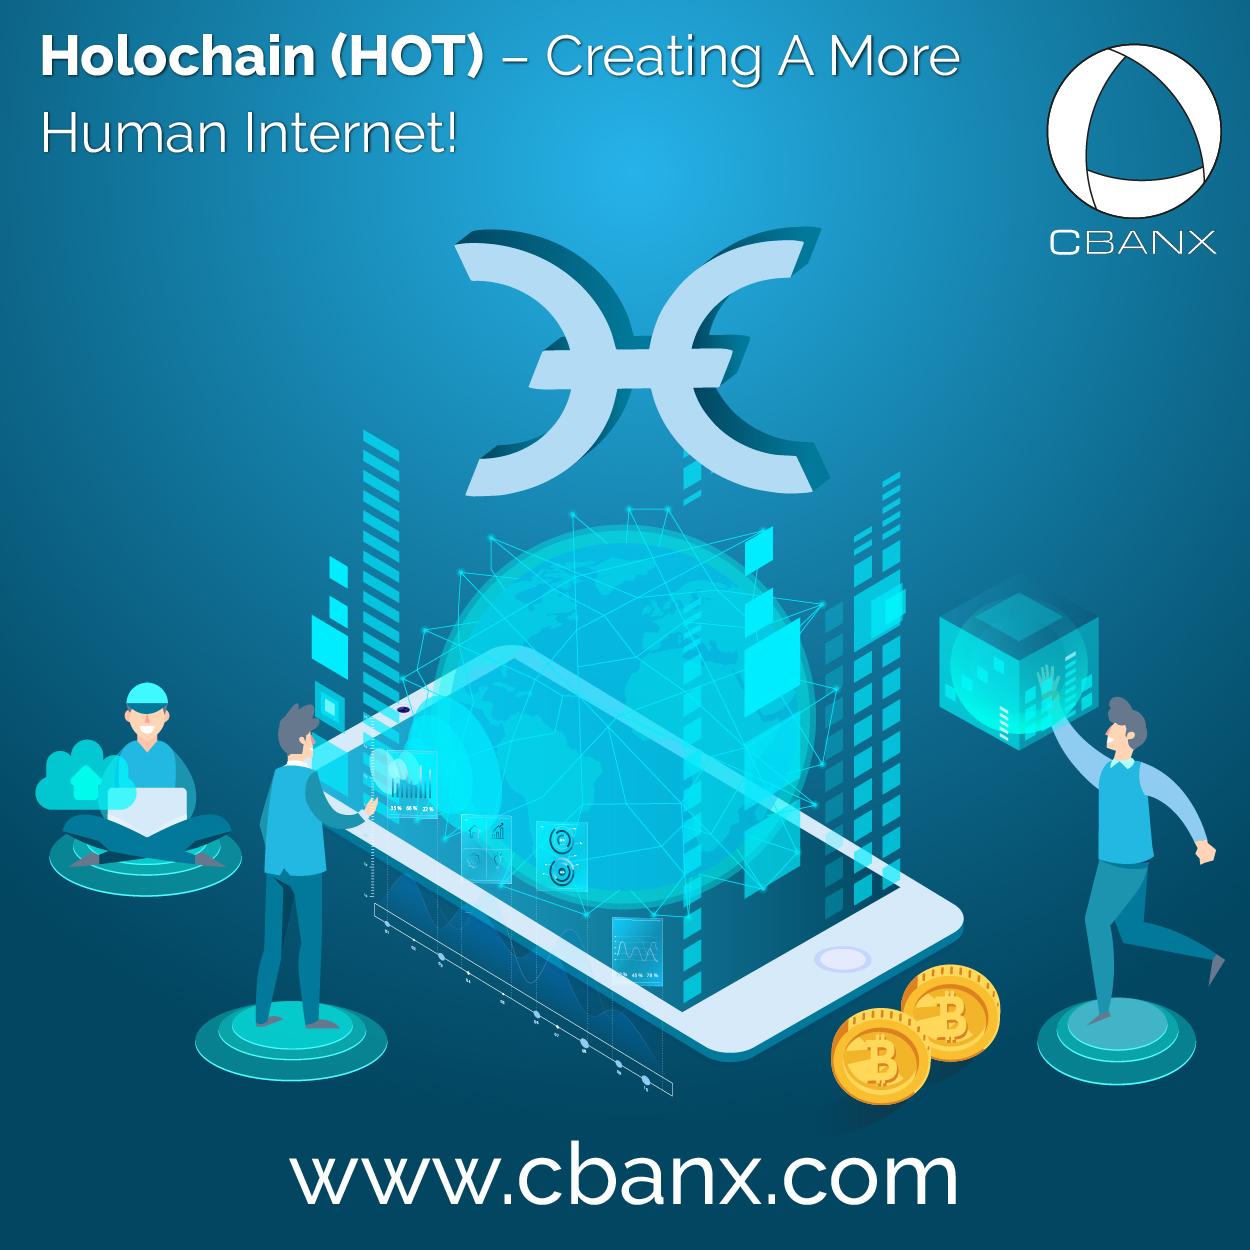 Holochain (HOT) – Creating A More Human Internet!